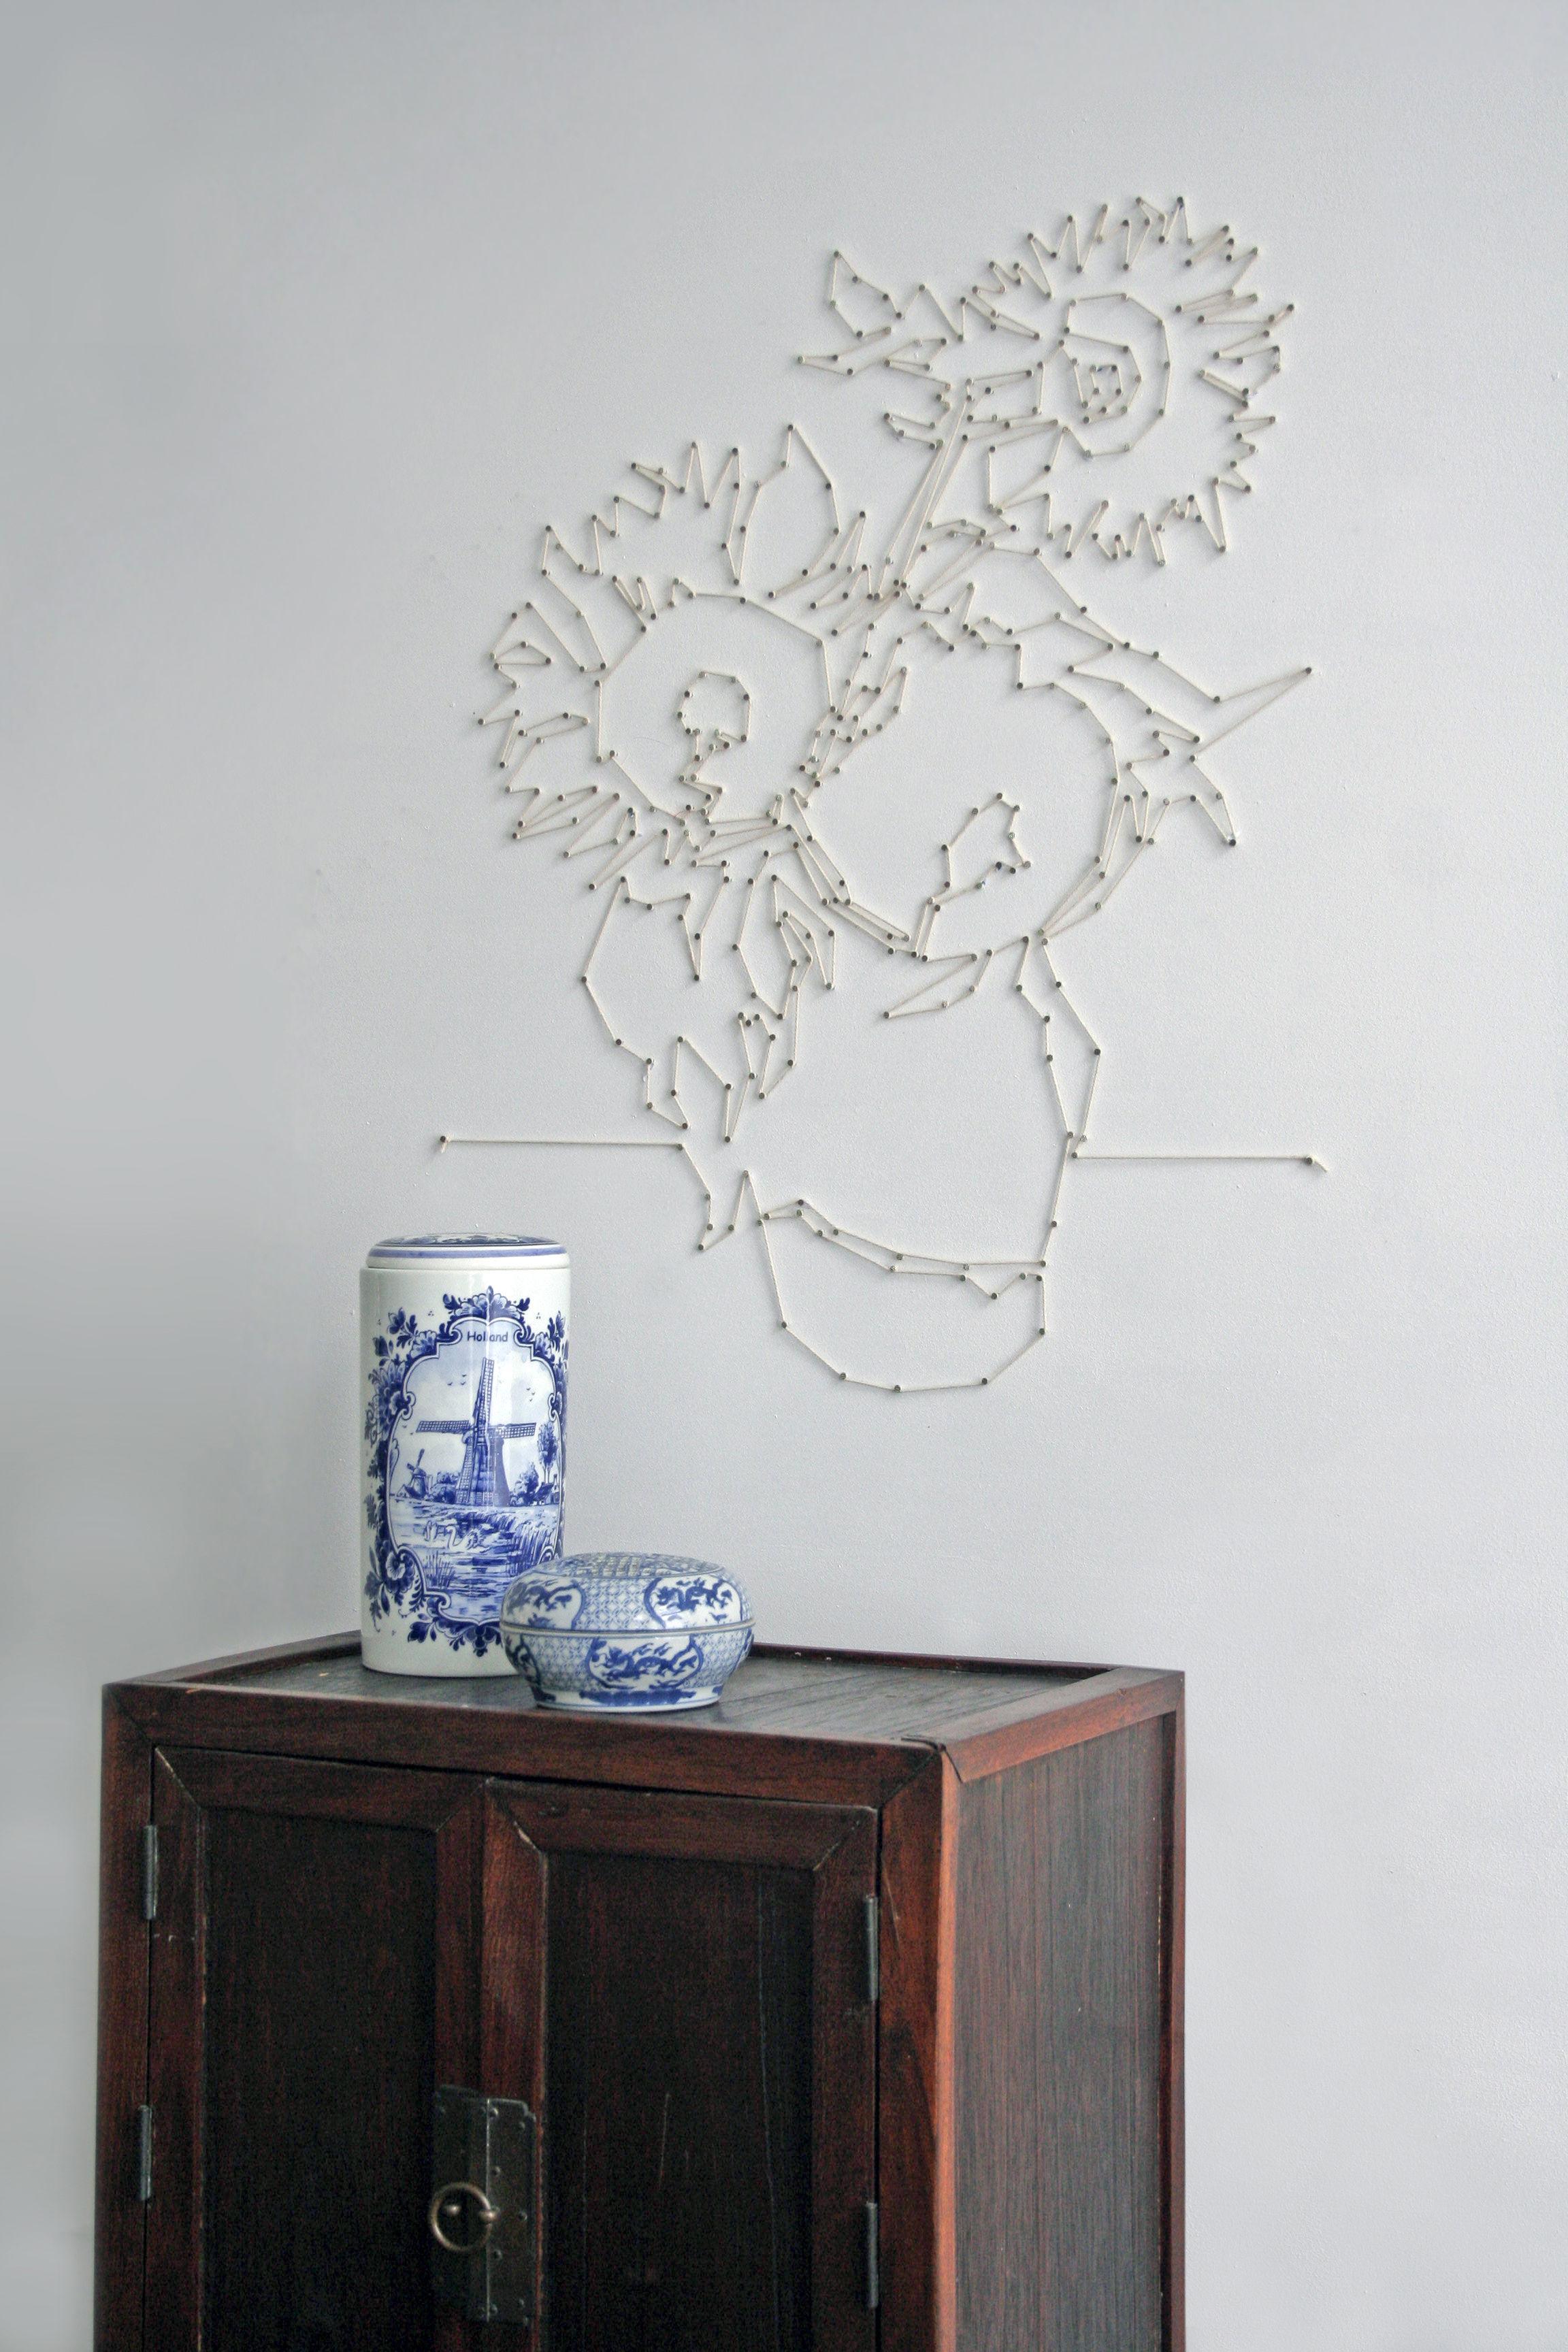 kit d coration masterpieces patron pour tableau en fil tendu blanc pa design made in design. Black Bedroom Furniture Sets. Home Design Ideas